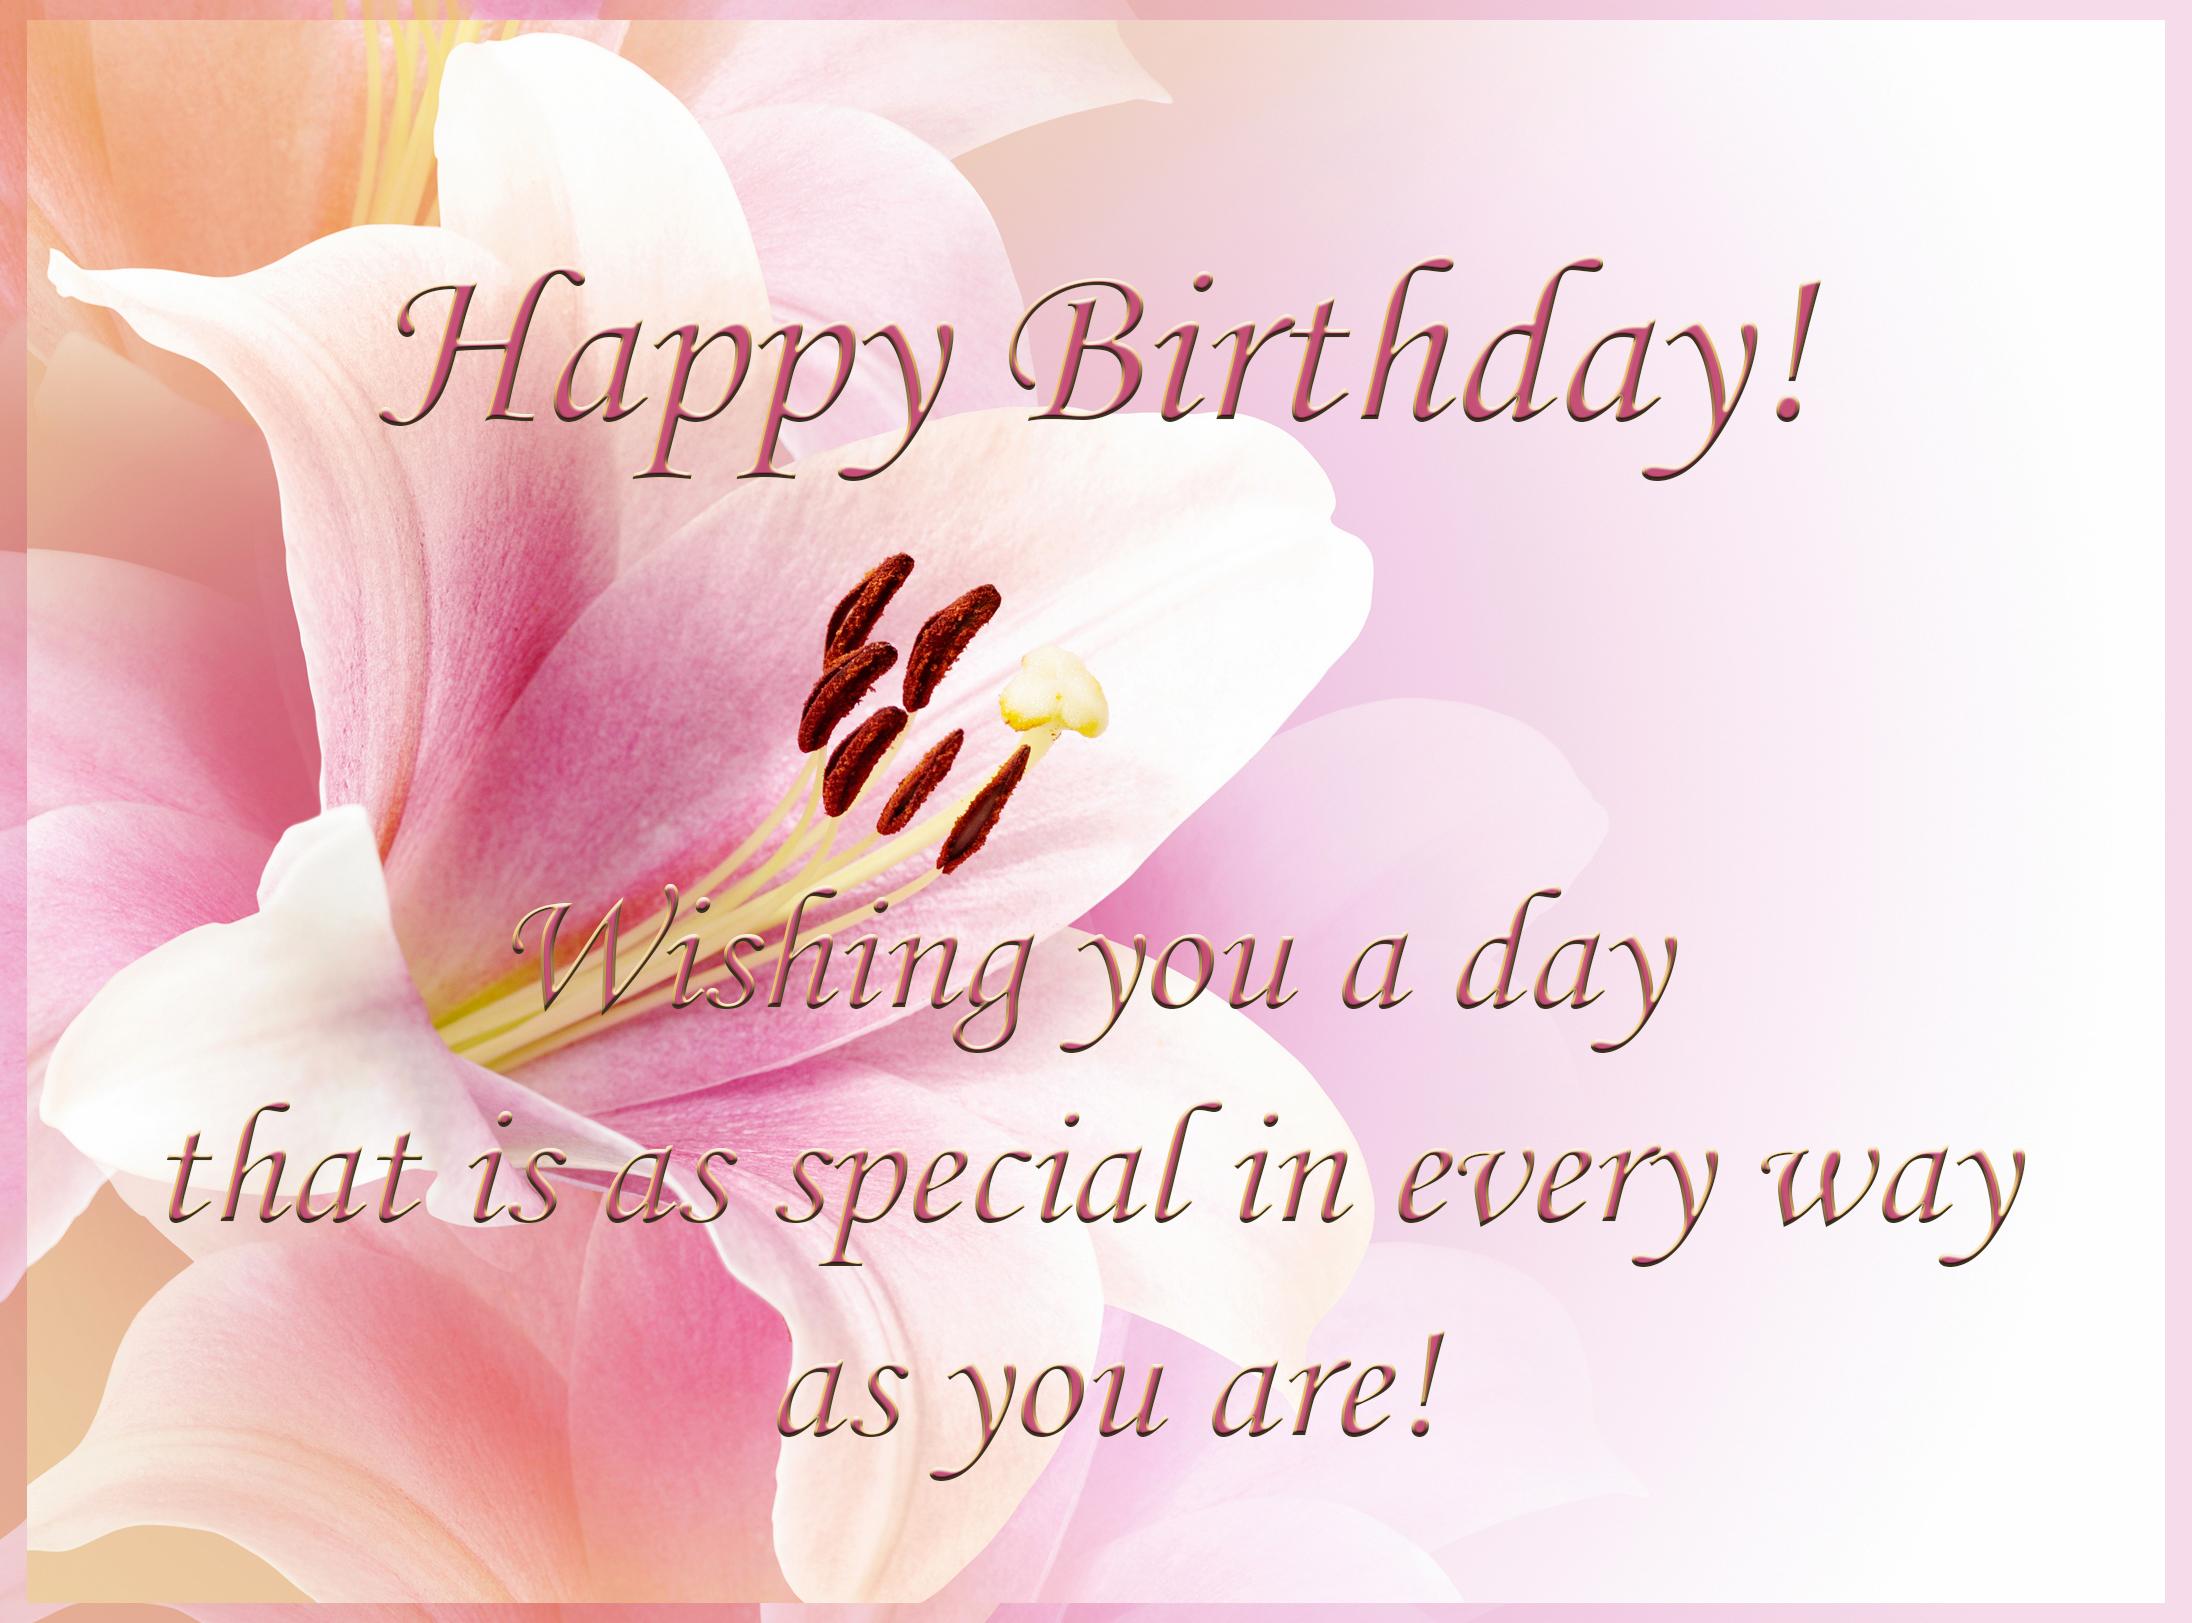 Happy Birthday Greeting Card.